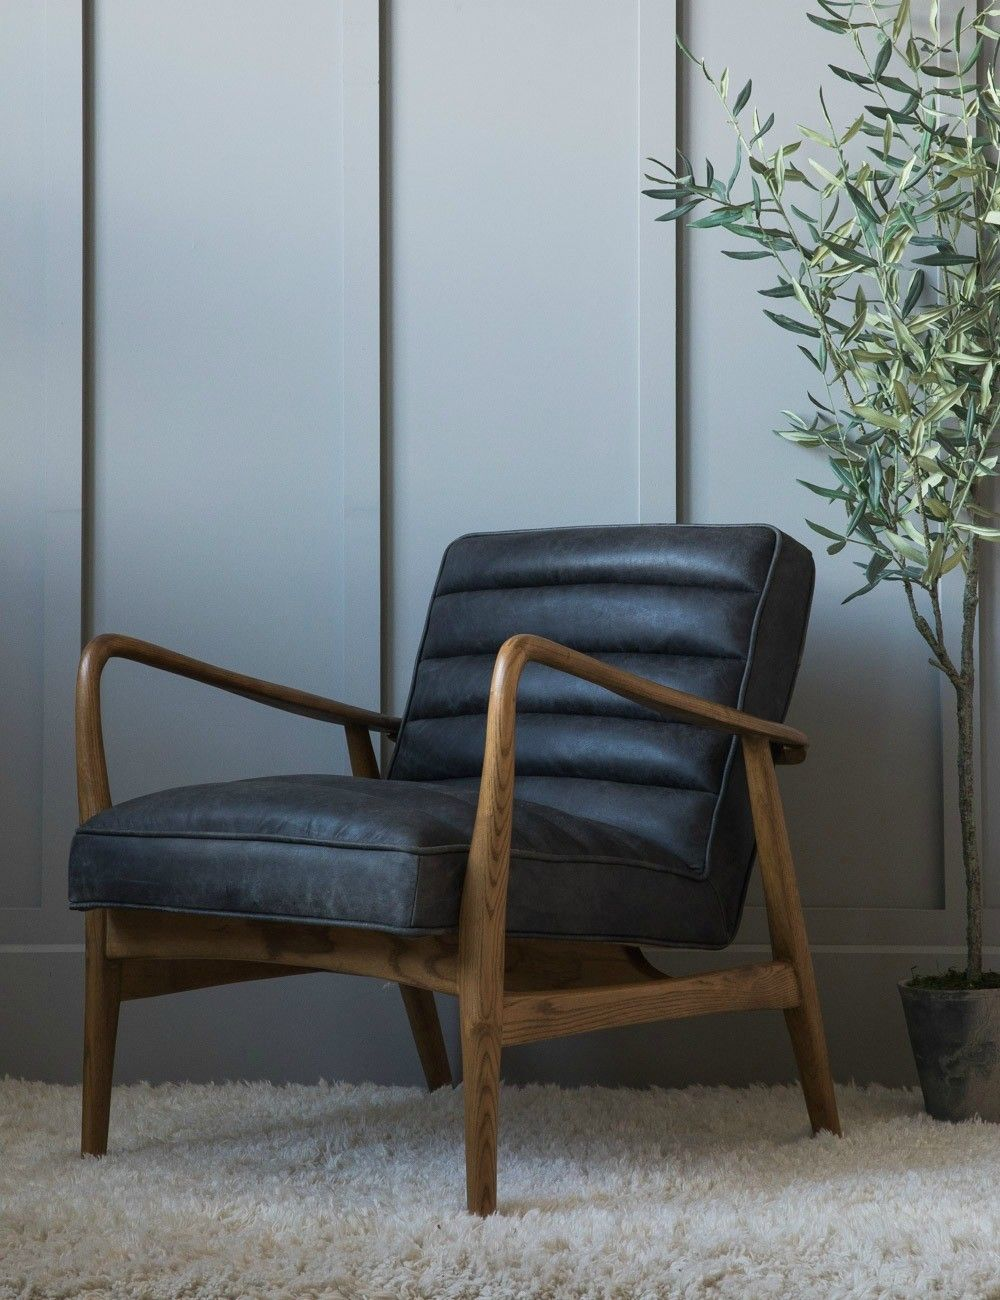 Best of mid century style armchairs